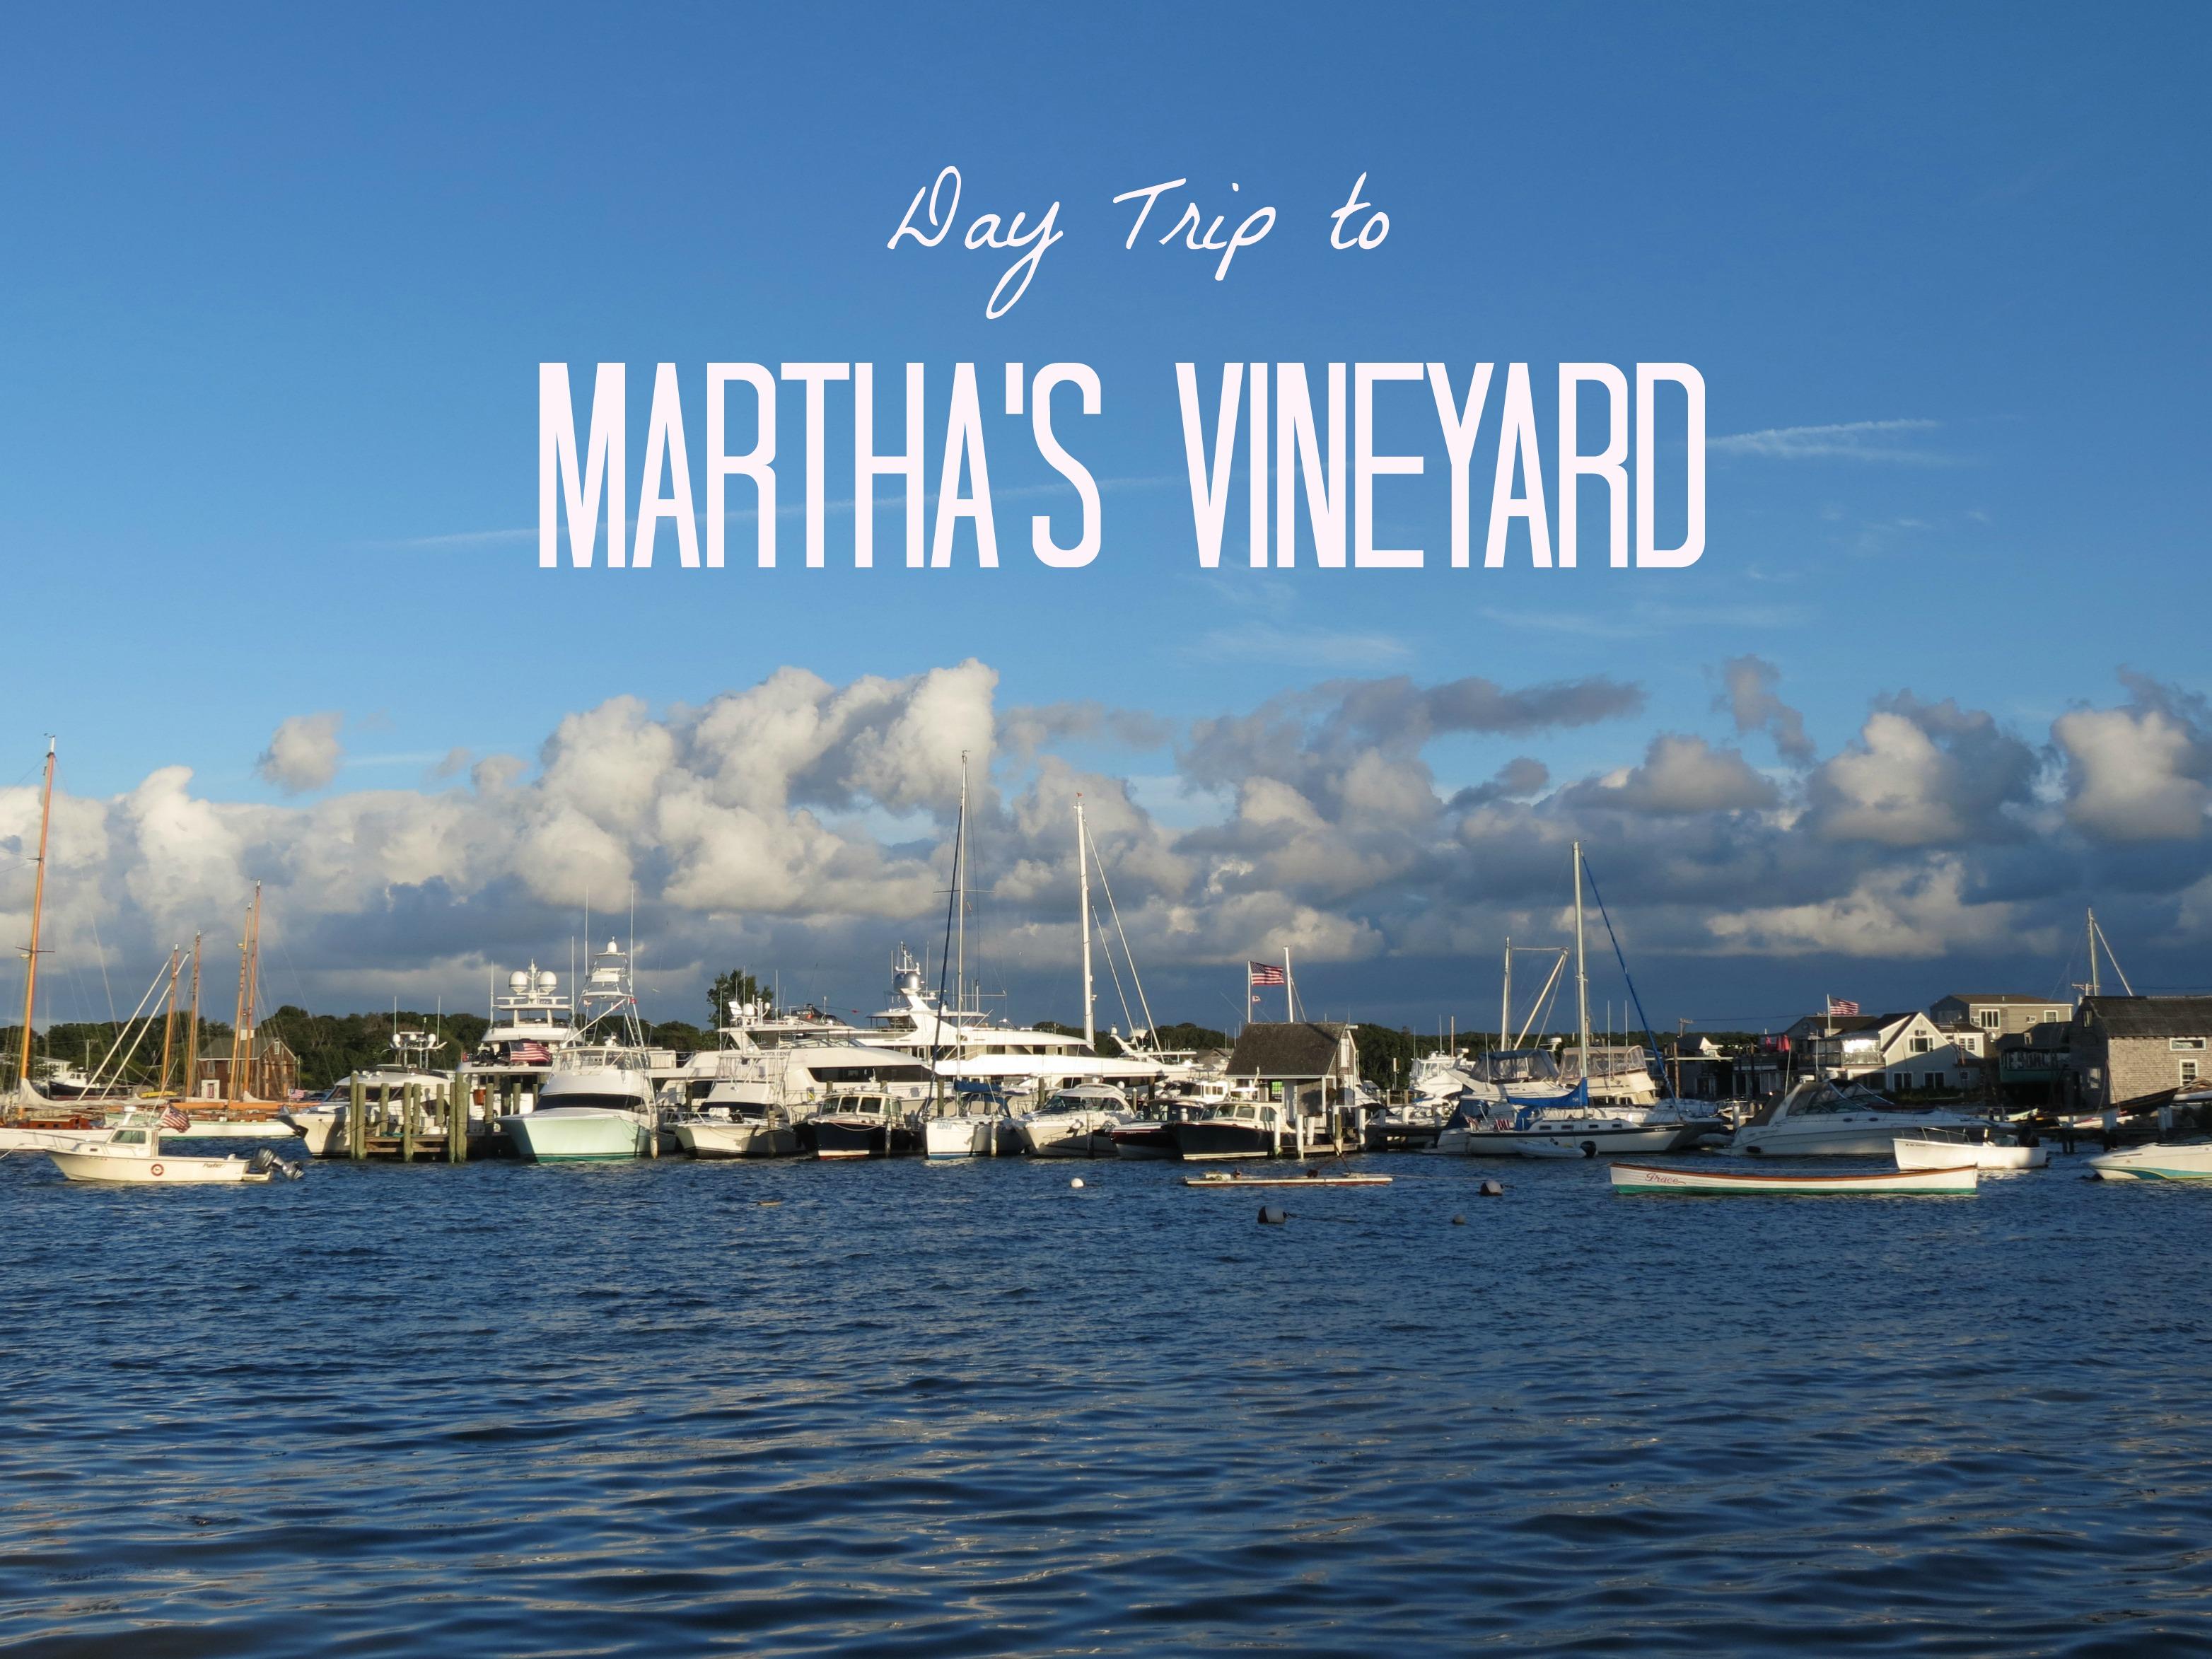 Biking Martha's Vineyard – oliveoloveblog